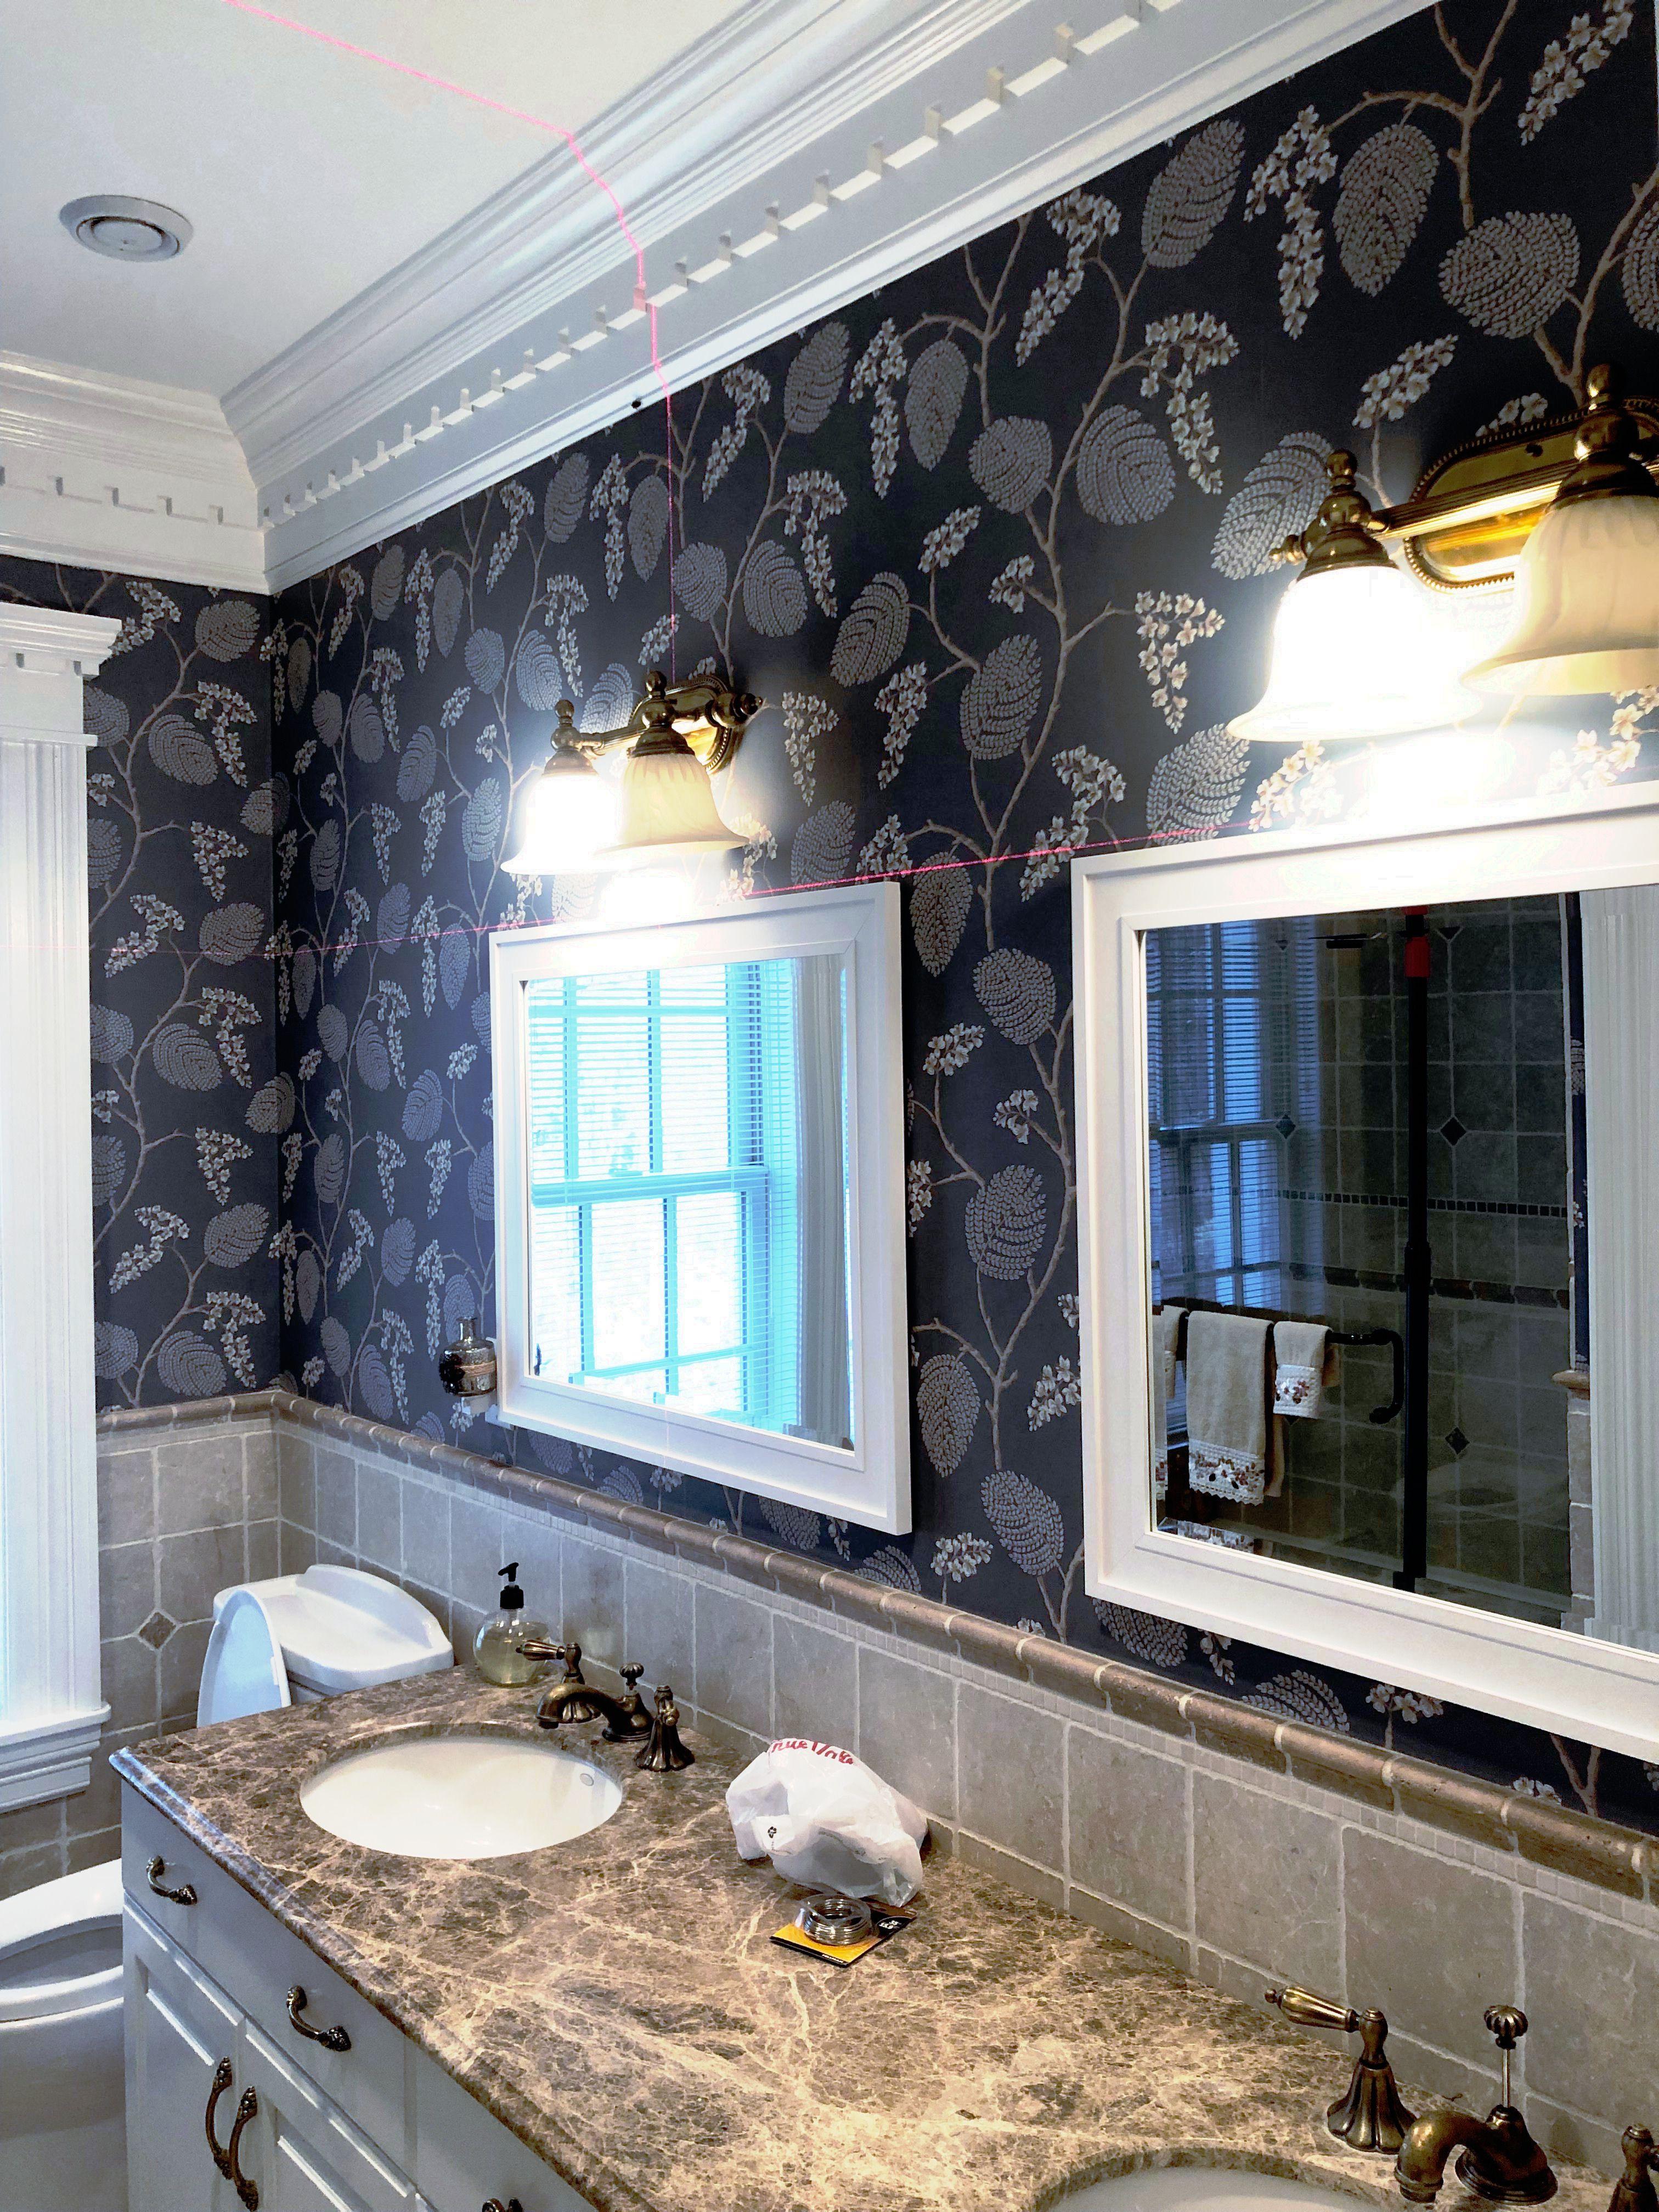 Bathroom Wallpaper How To Install Wallpaper Bathroom Wallpaper Bathroom Mirror